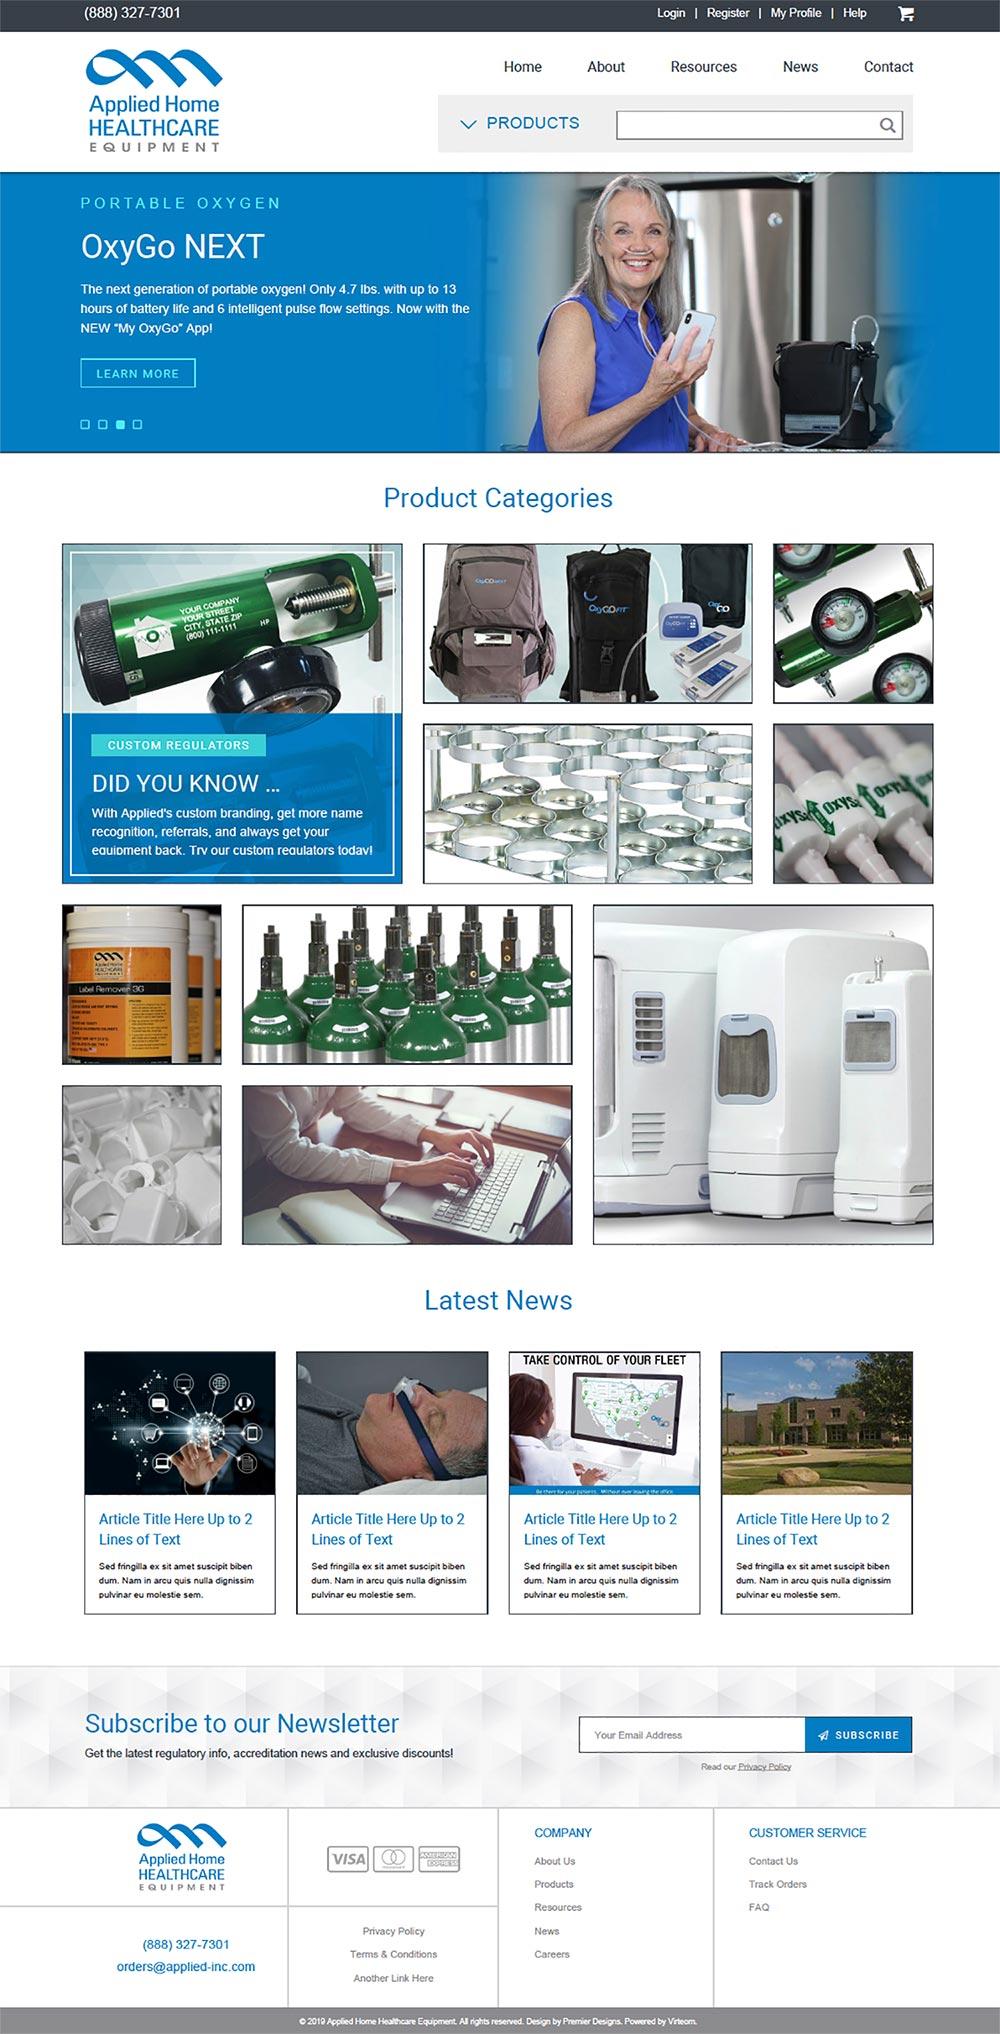 Healthcare e-commerce website design